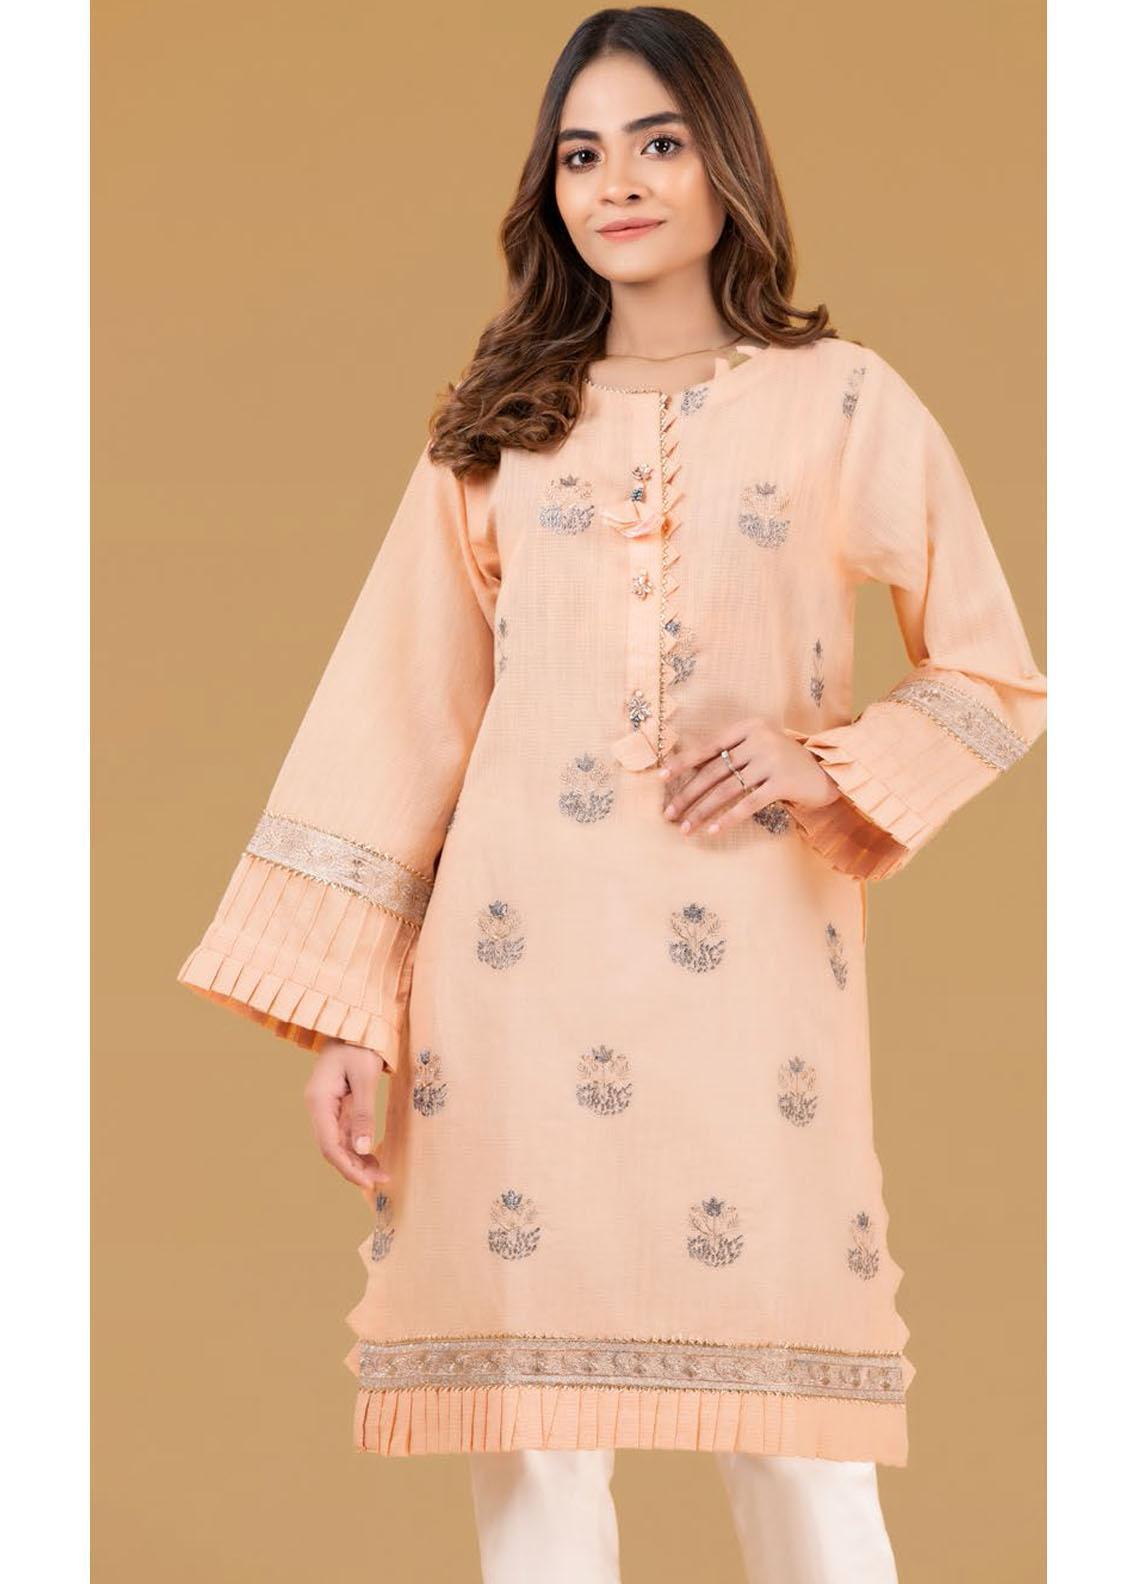 Gul Ahmed Luxury Pret Embroidered Cotton Kurties GA21K WGK-YDS-DE-409